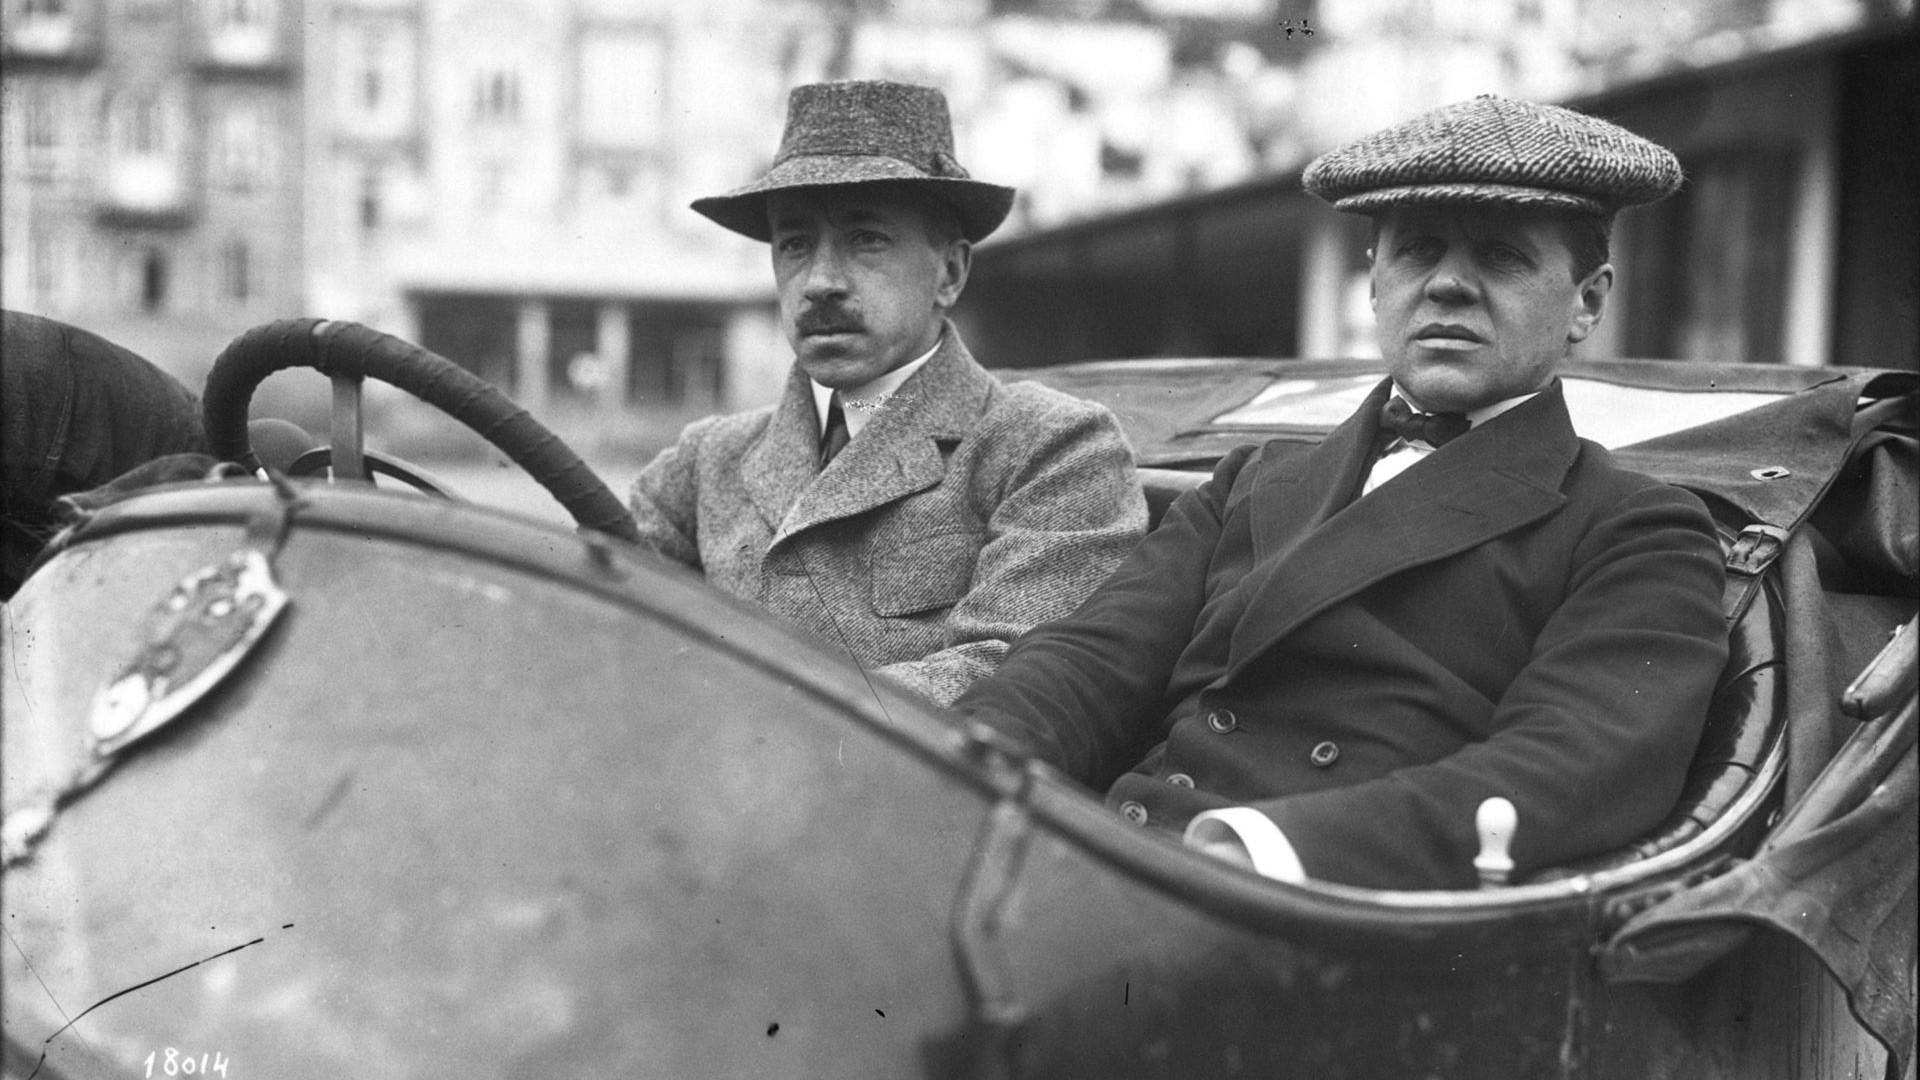 Andrei Nagel (on the left)